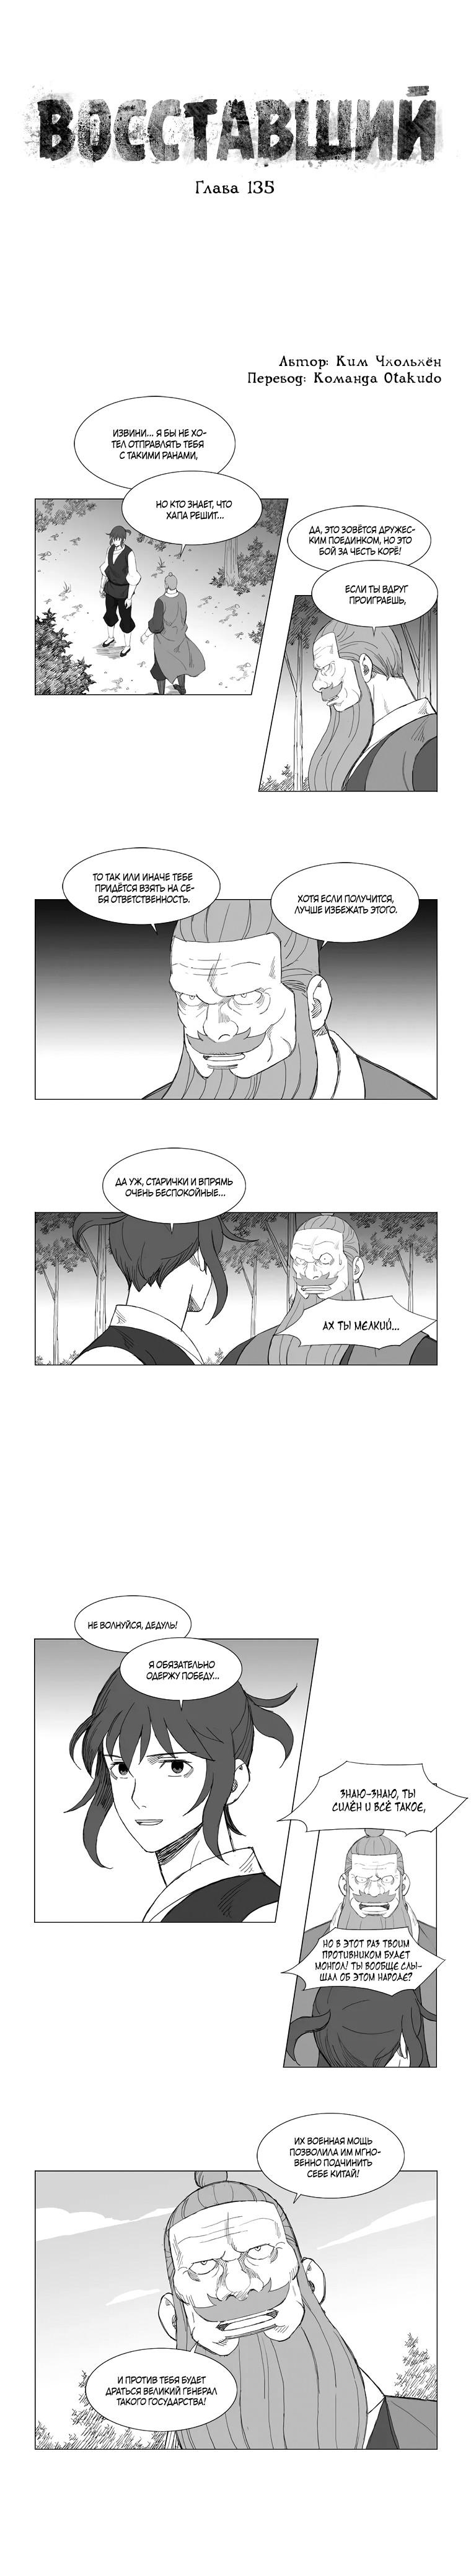 https://r1.ninemanga.com/comics/pic2/39/28263/424284/1534798821557.jpg Page 1